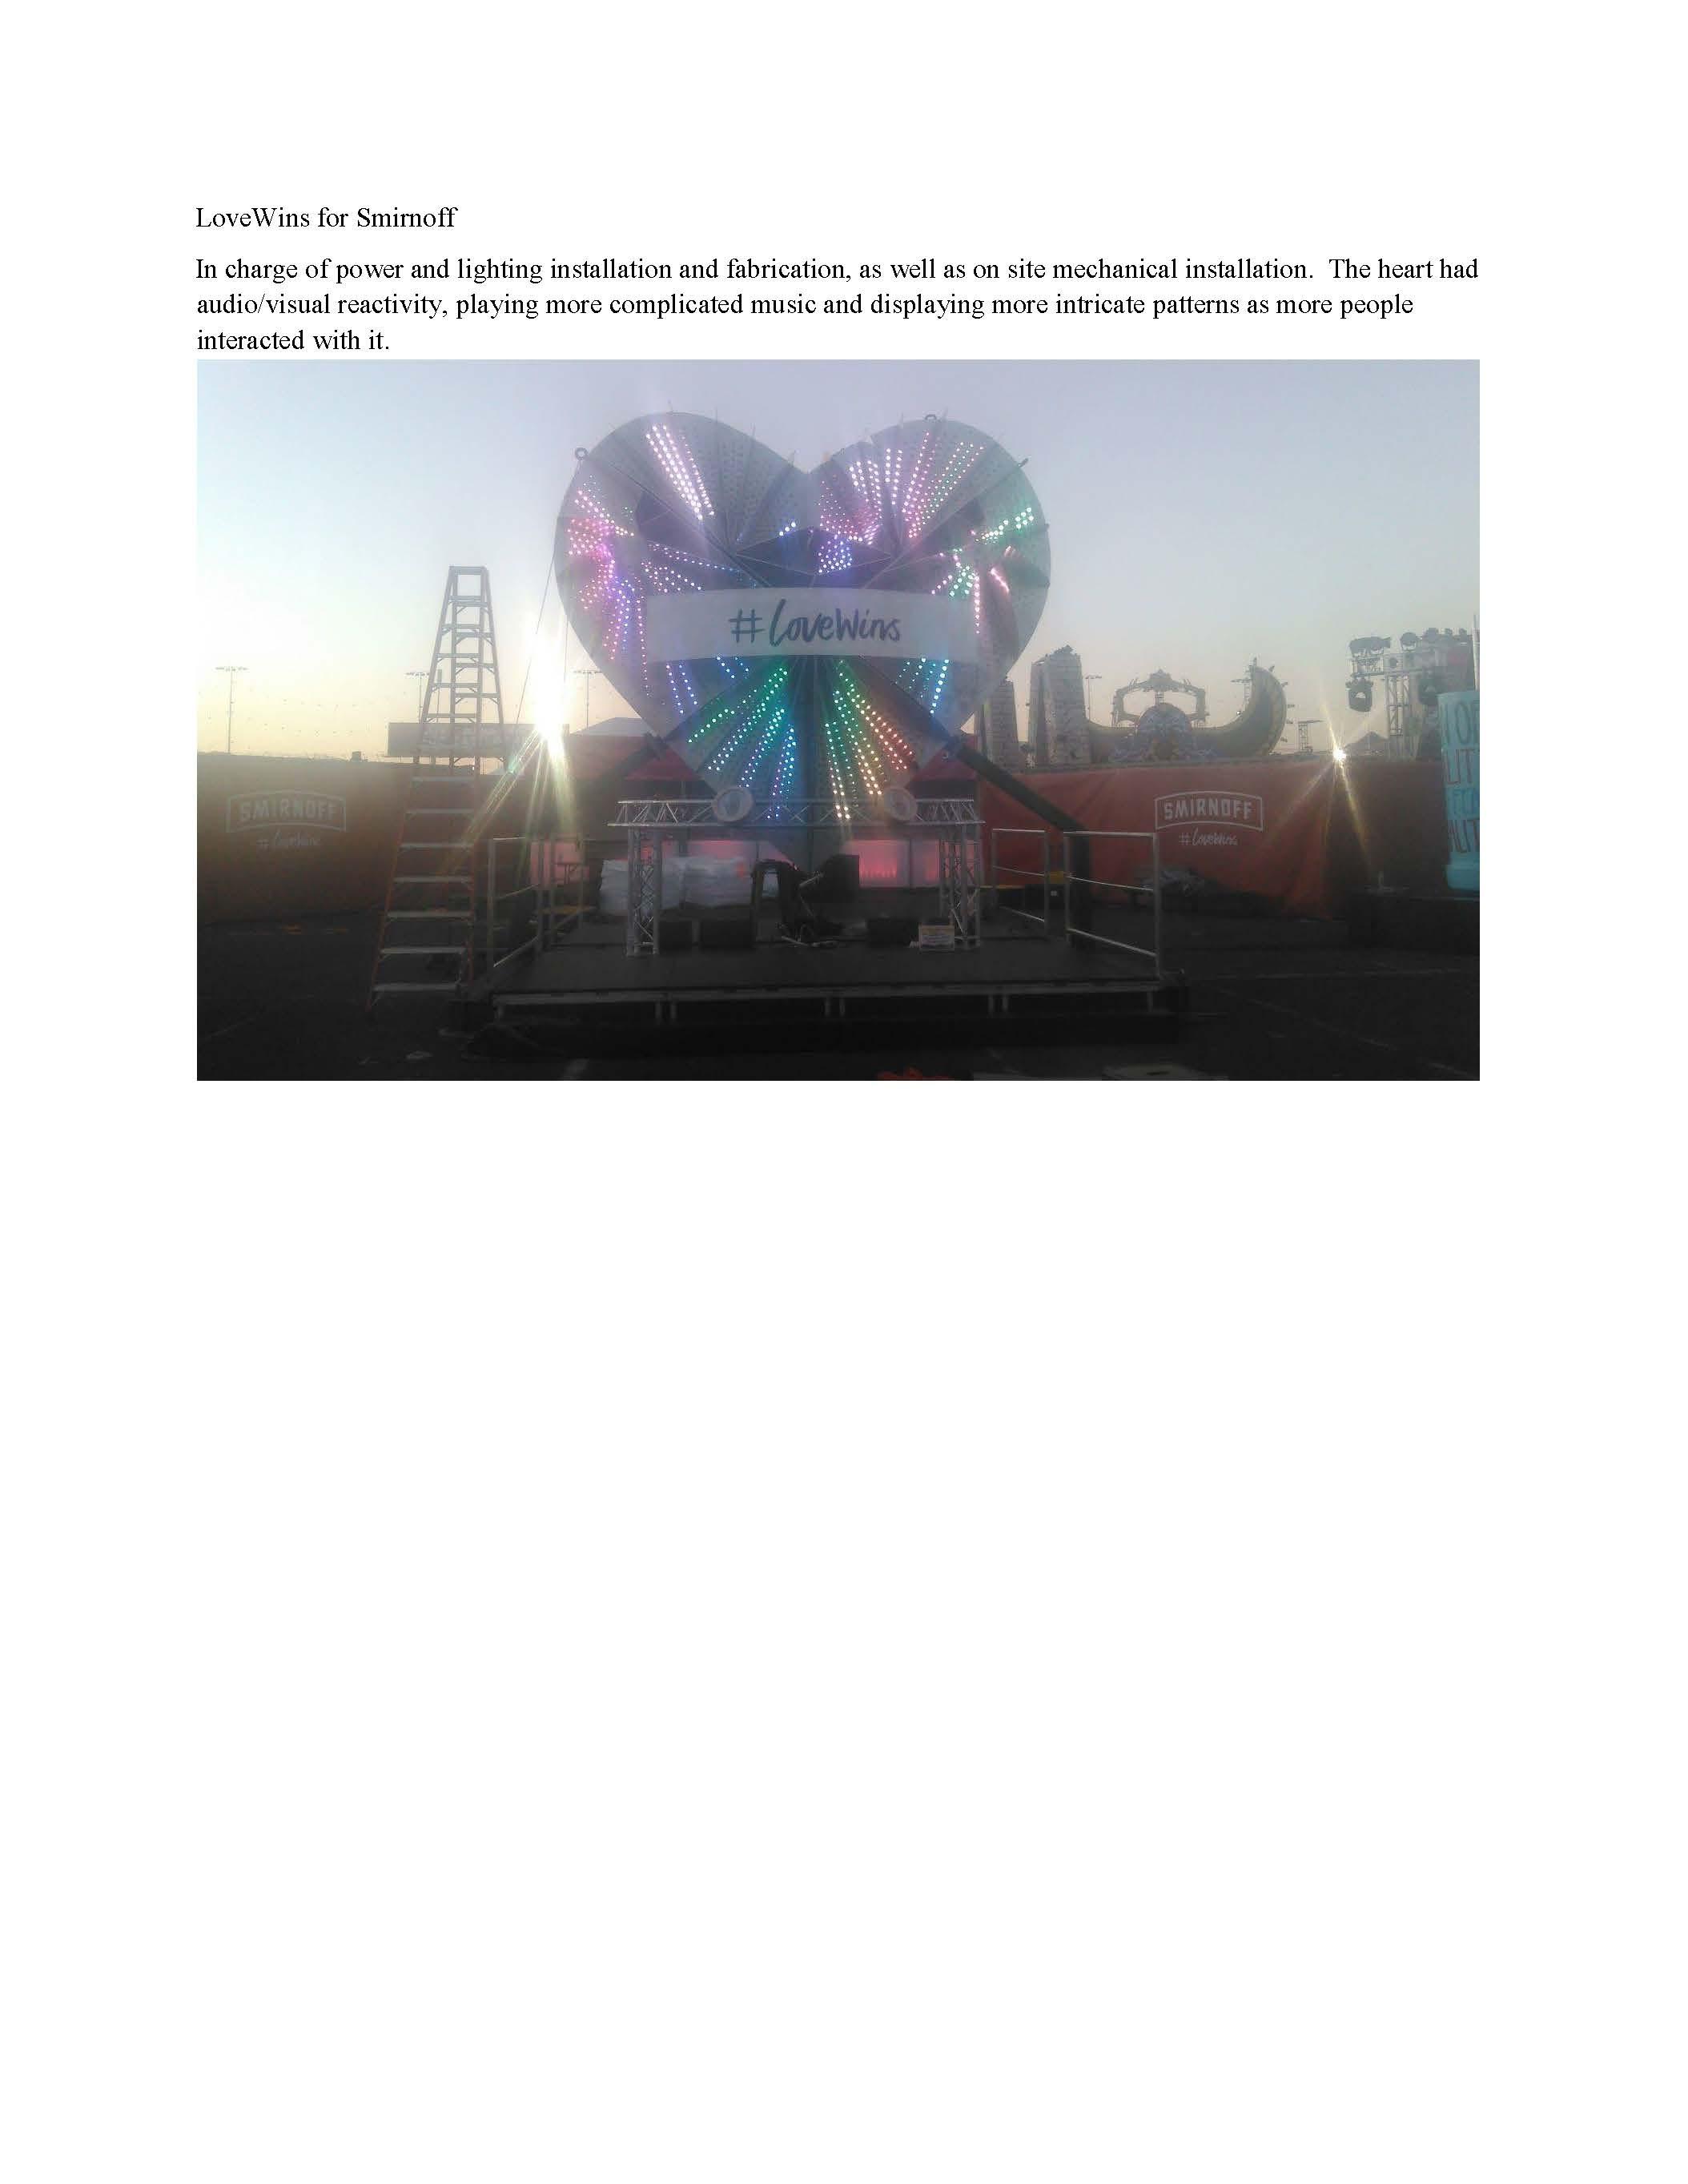 randys porfolio for slideshow_Page_11.jpg